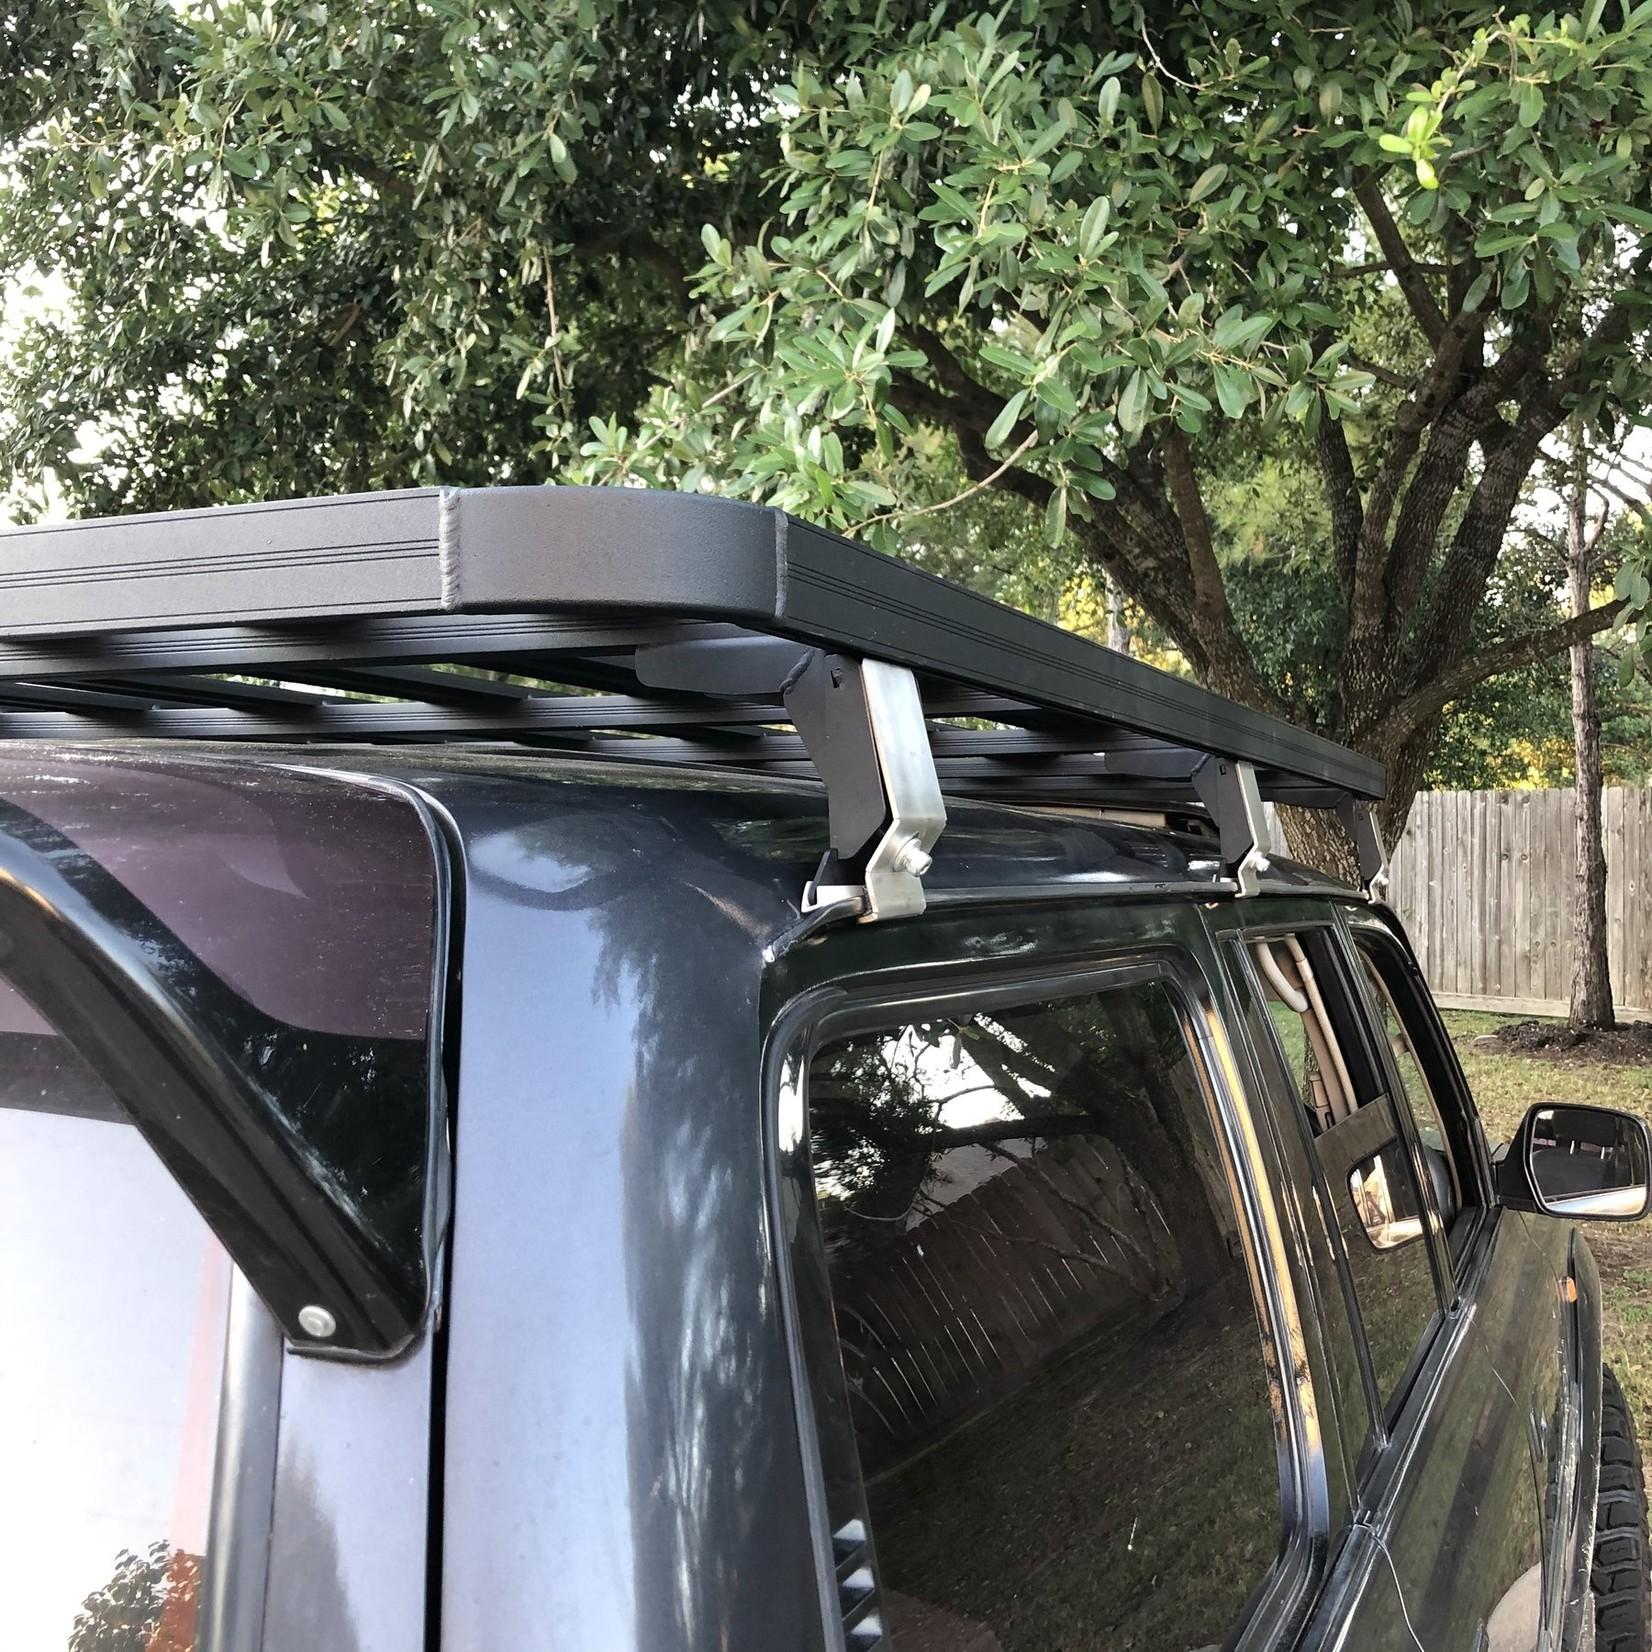 Big Country 4x4 Big Country 4x4 Toyota Land Cruiser 80 Roof Rack